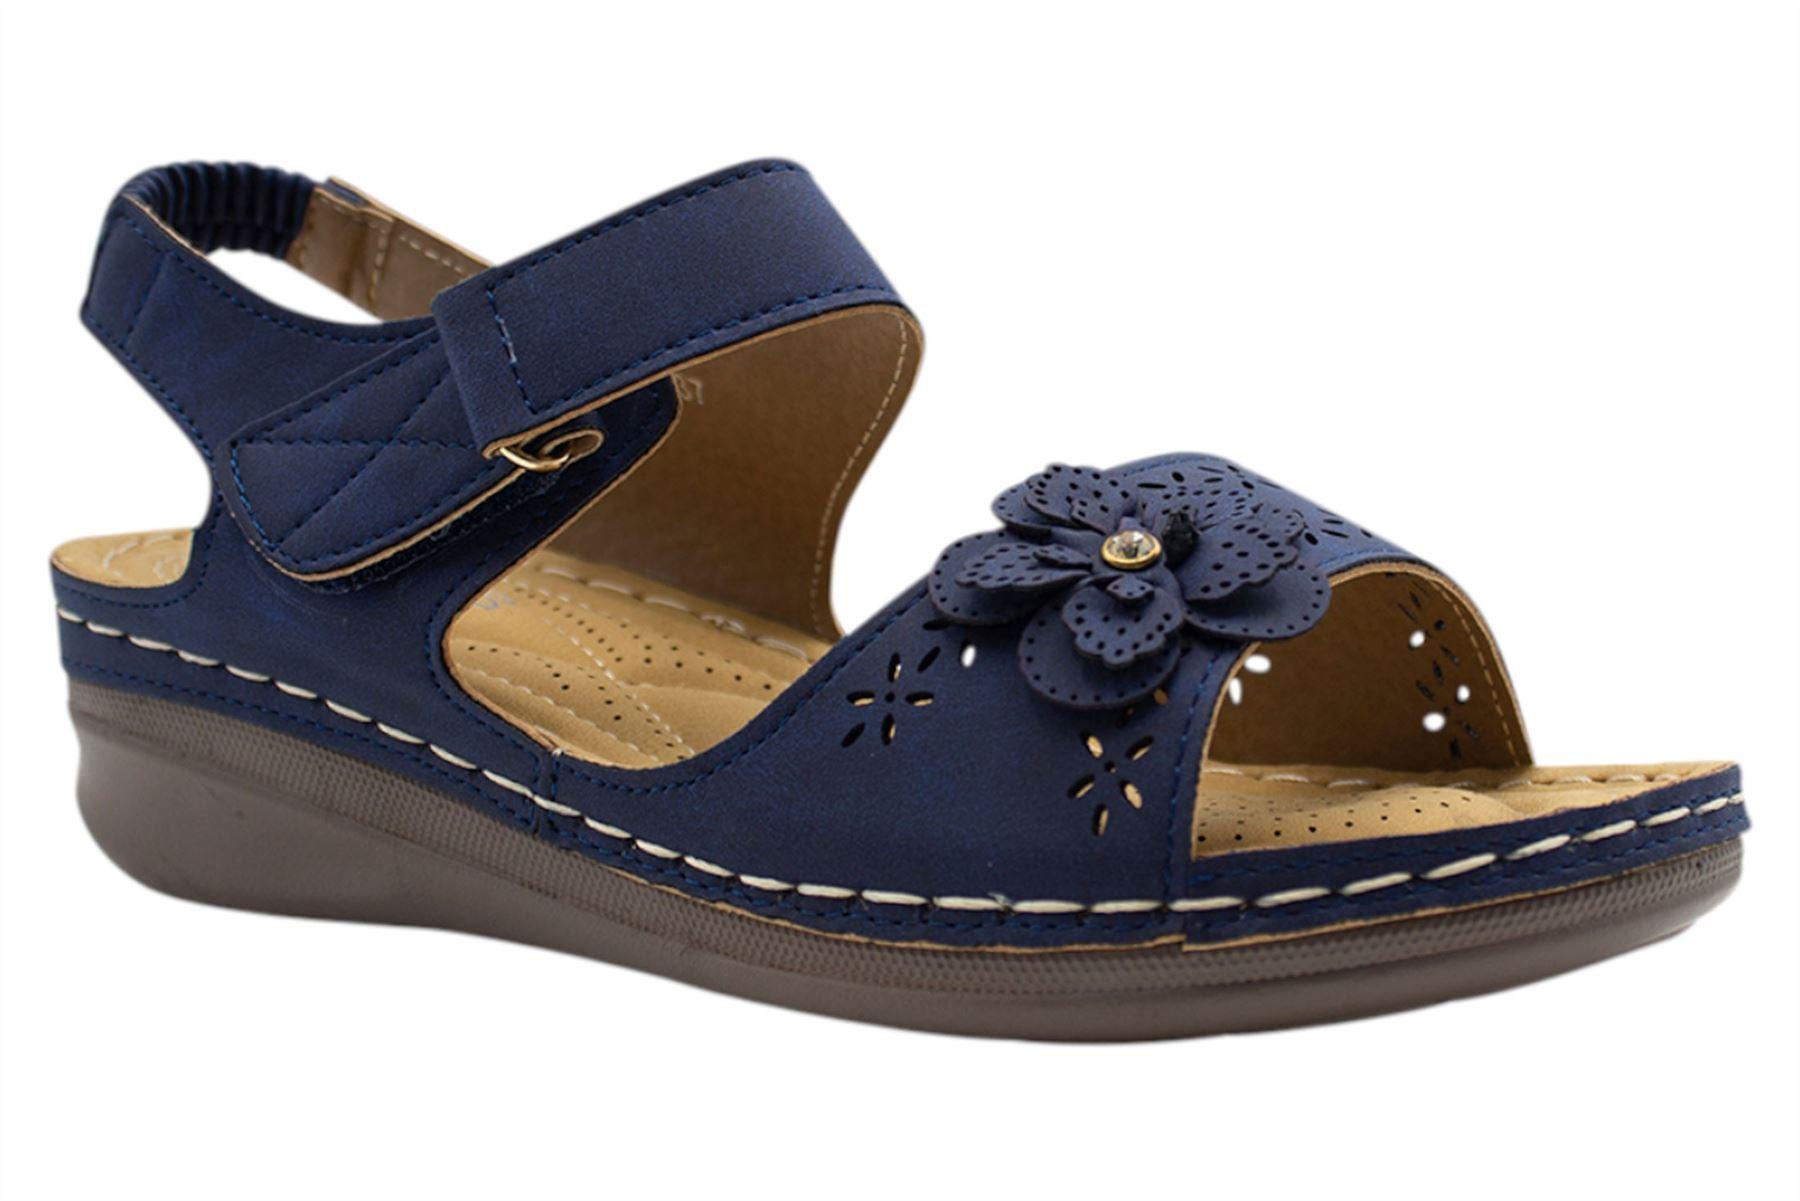 Ladies-Sandals-Womens-Mid-Heel-Comfort-Summer-Beach-Casual-Wear miniatura 38